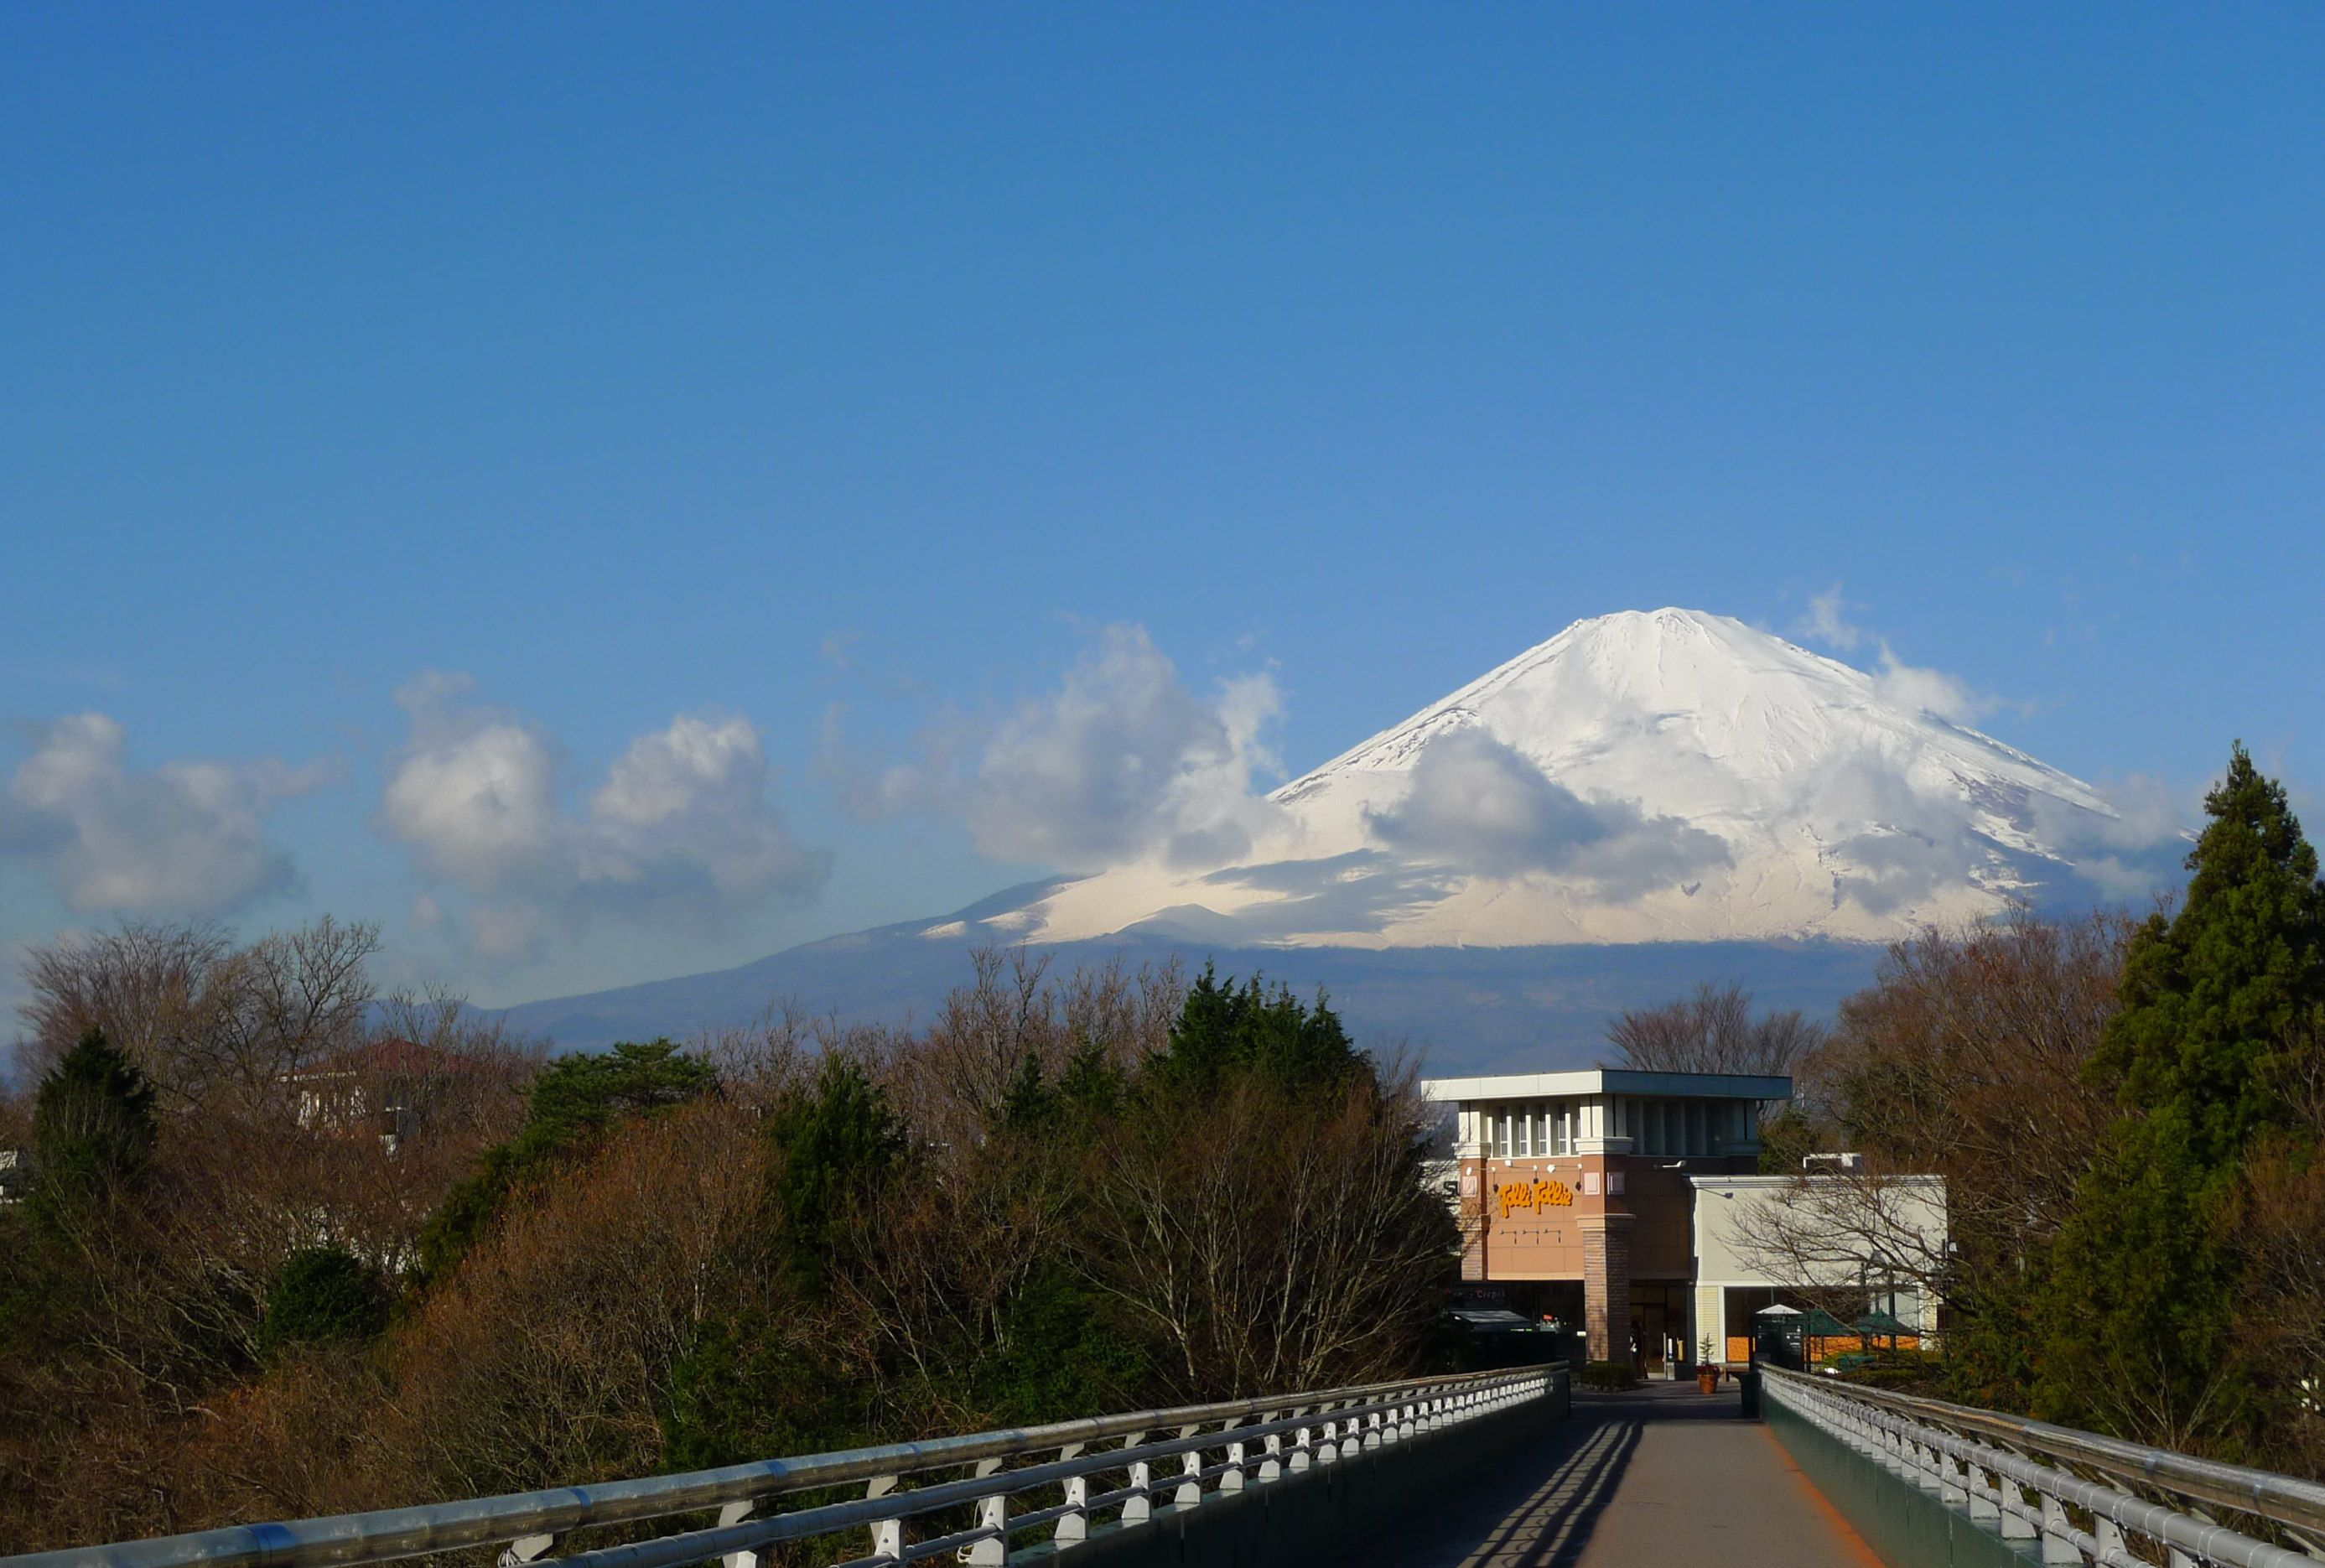 Mount Fuji View Gotemba Premium Outlets